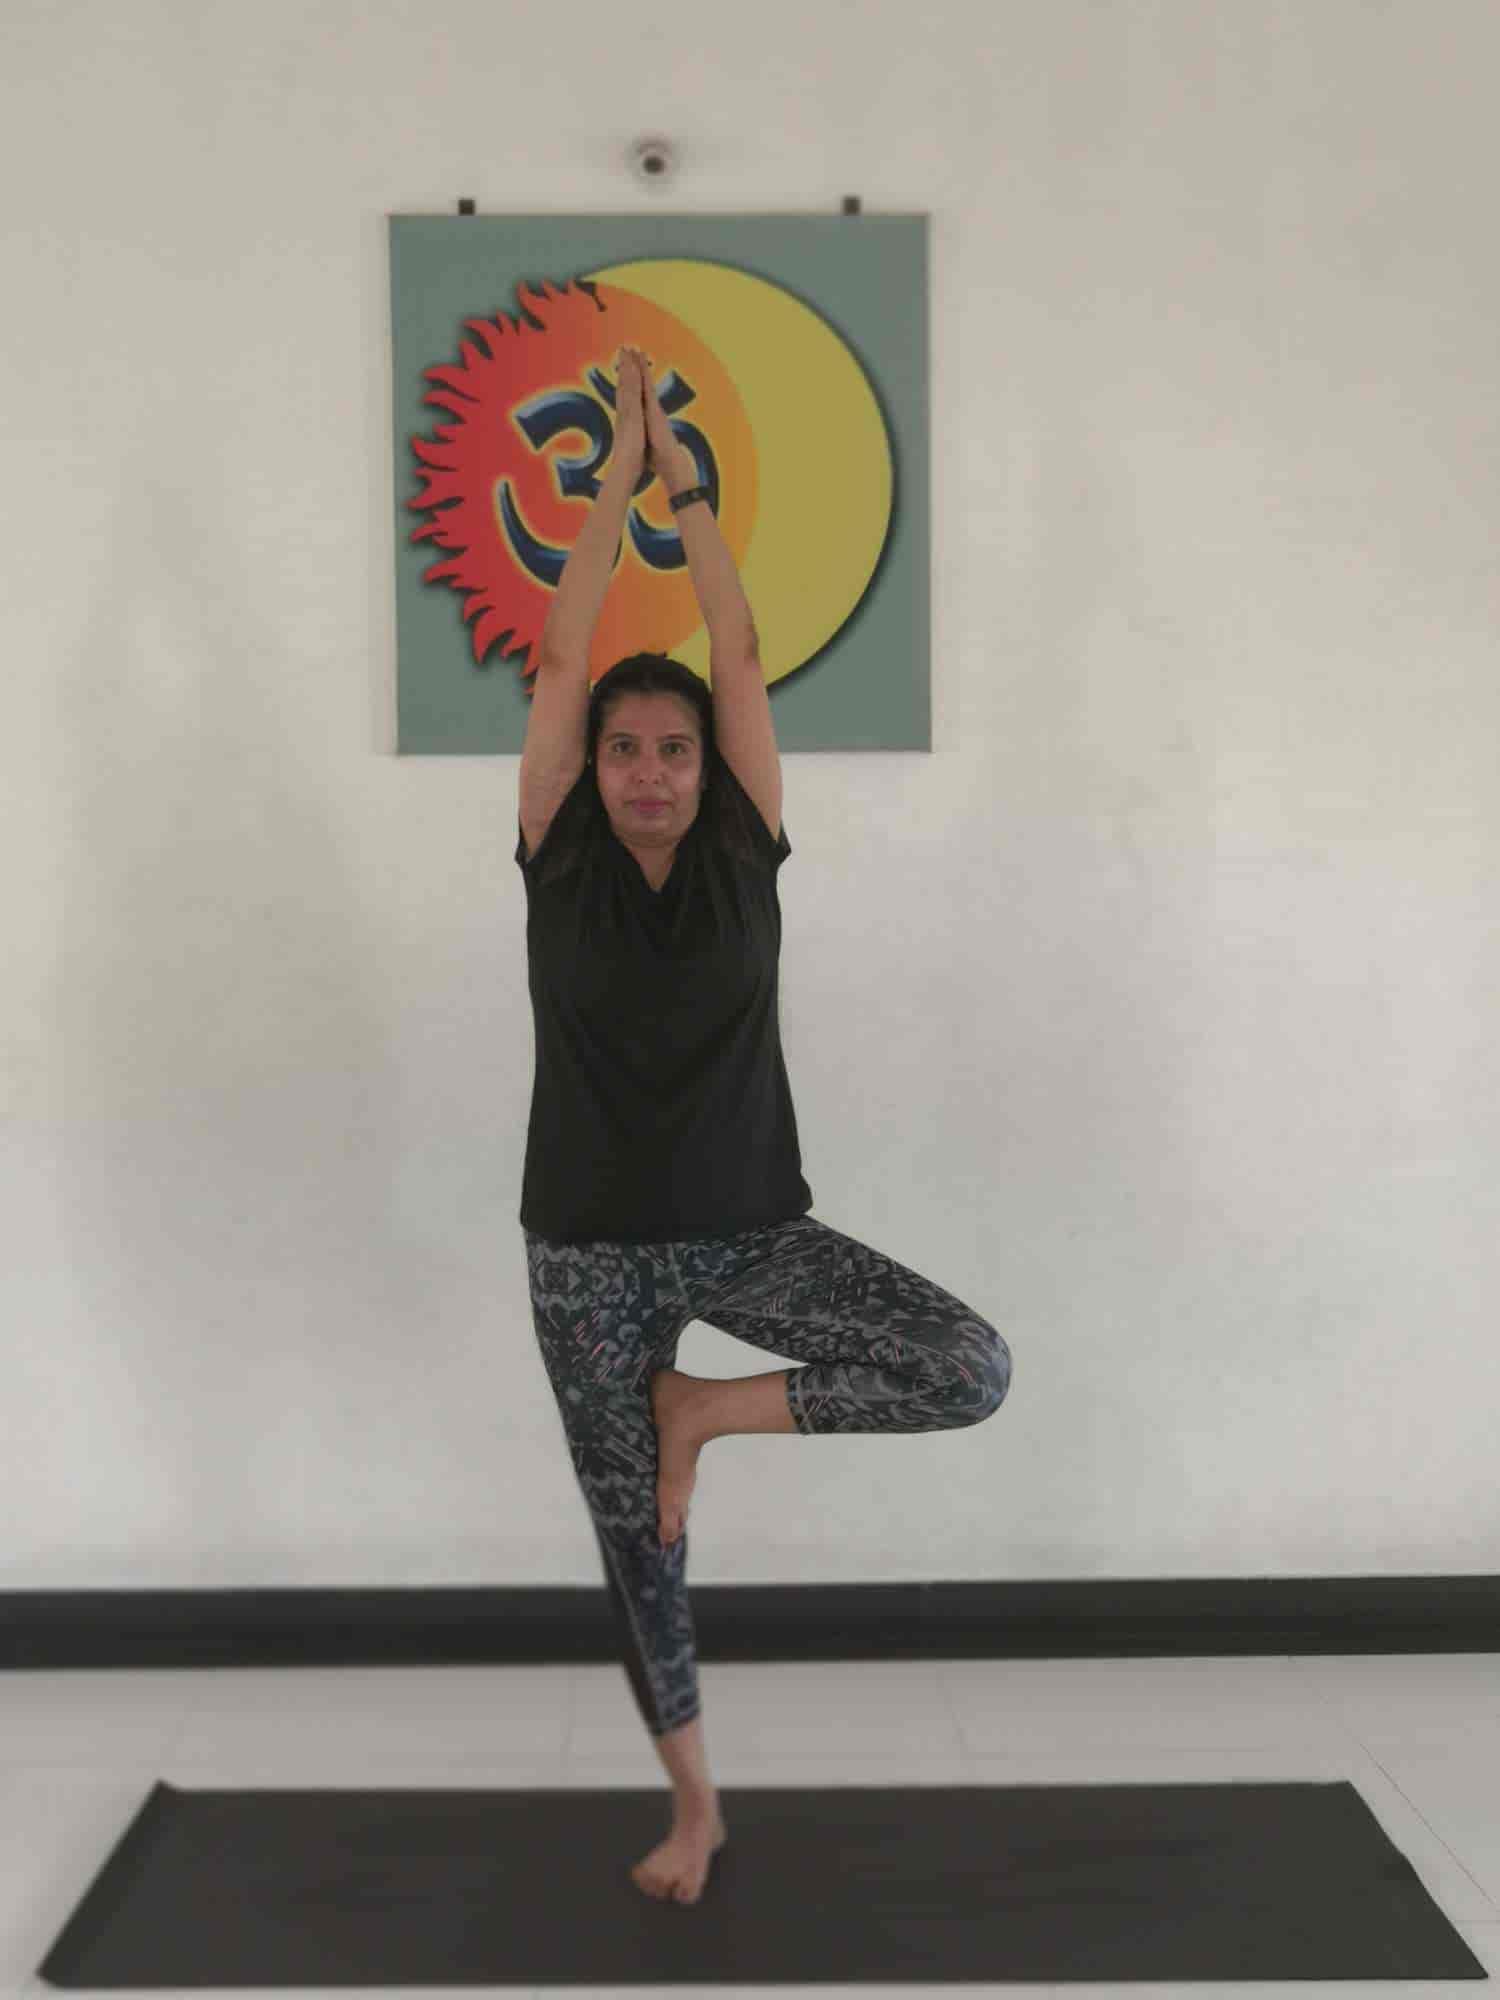 mk fitness kandivali west yoga classes at home in mumbai justdial rh t justdial com